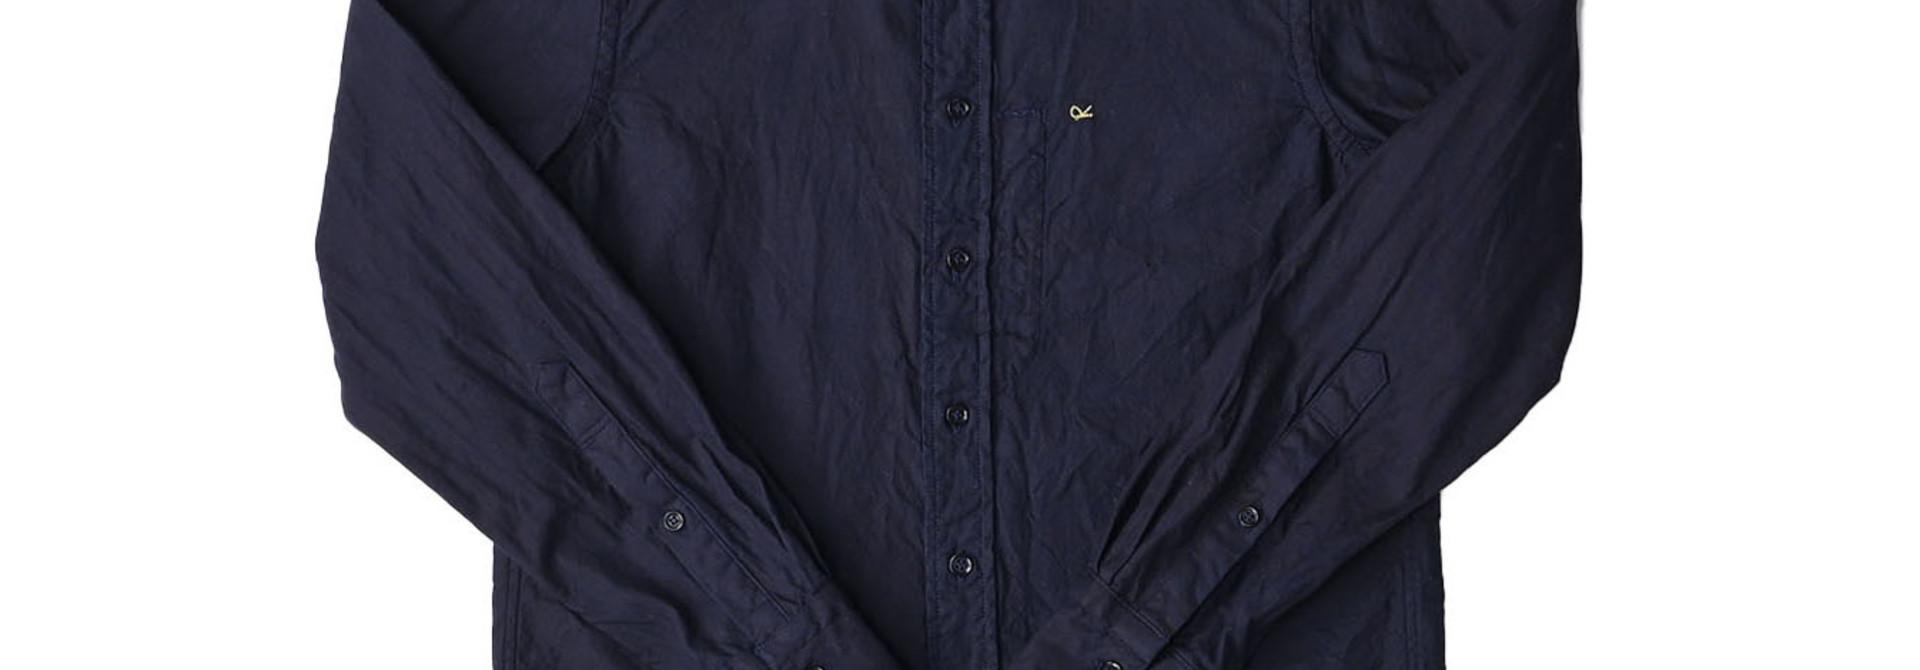 Indigo  Zimbabwe Oxford 908 Regular Shirt